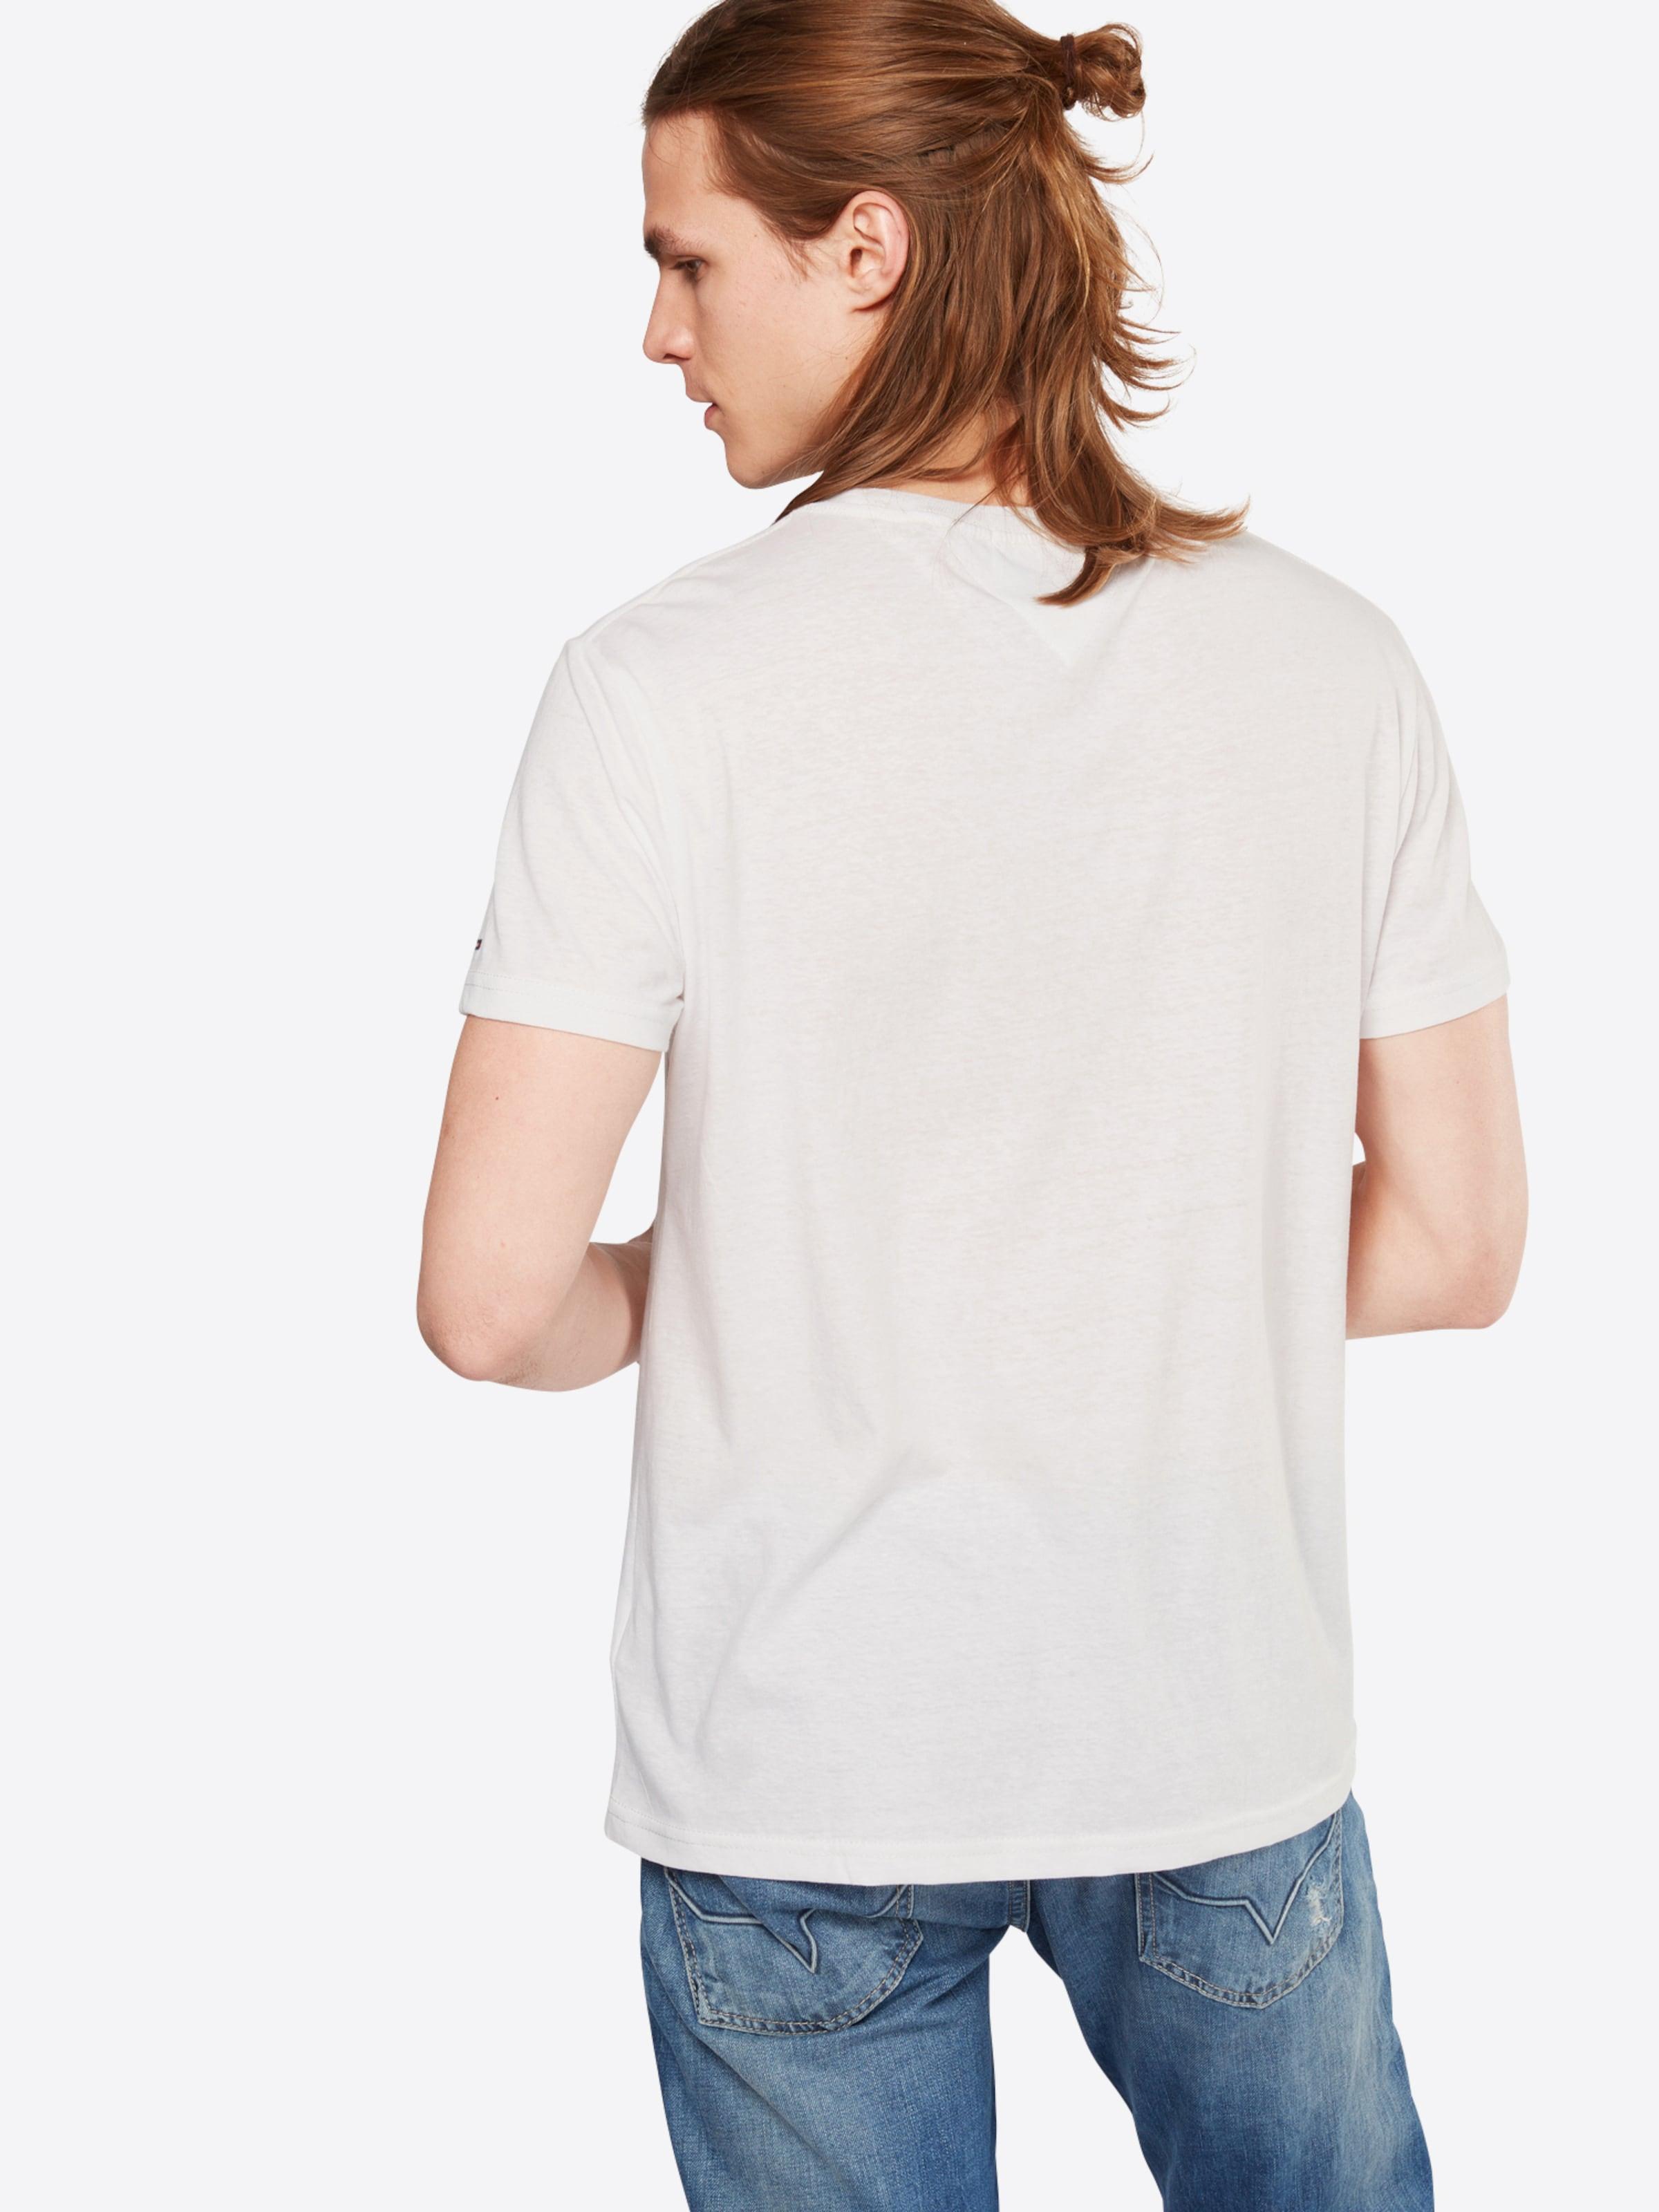 Für Billigen Rabatt Tommy Jeans T-Shirt 'TJM ESSENTIAL LOGO' Verkauf Truhe Finish p3DEwRO